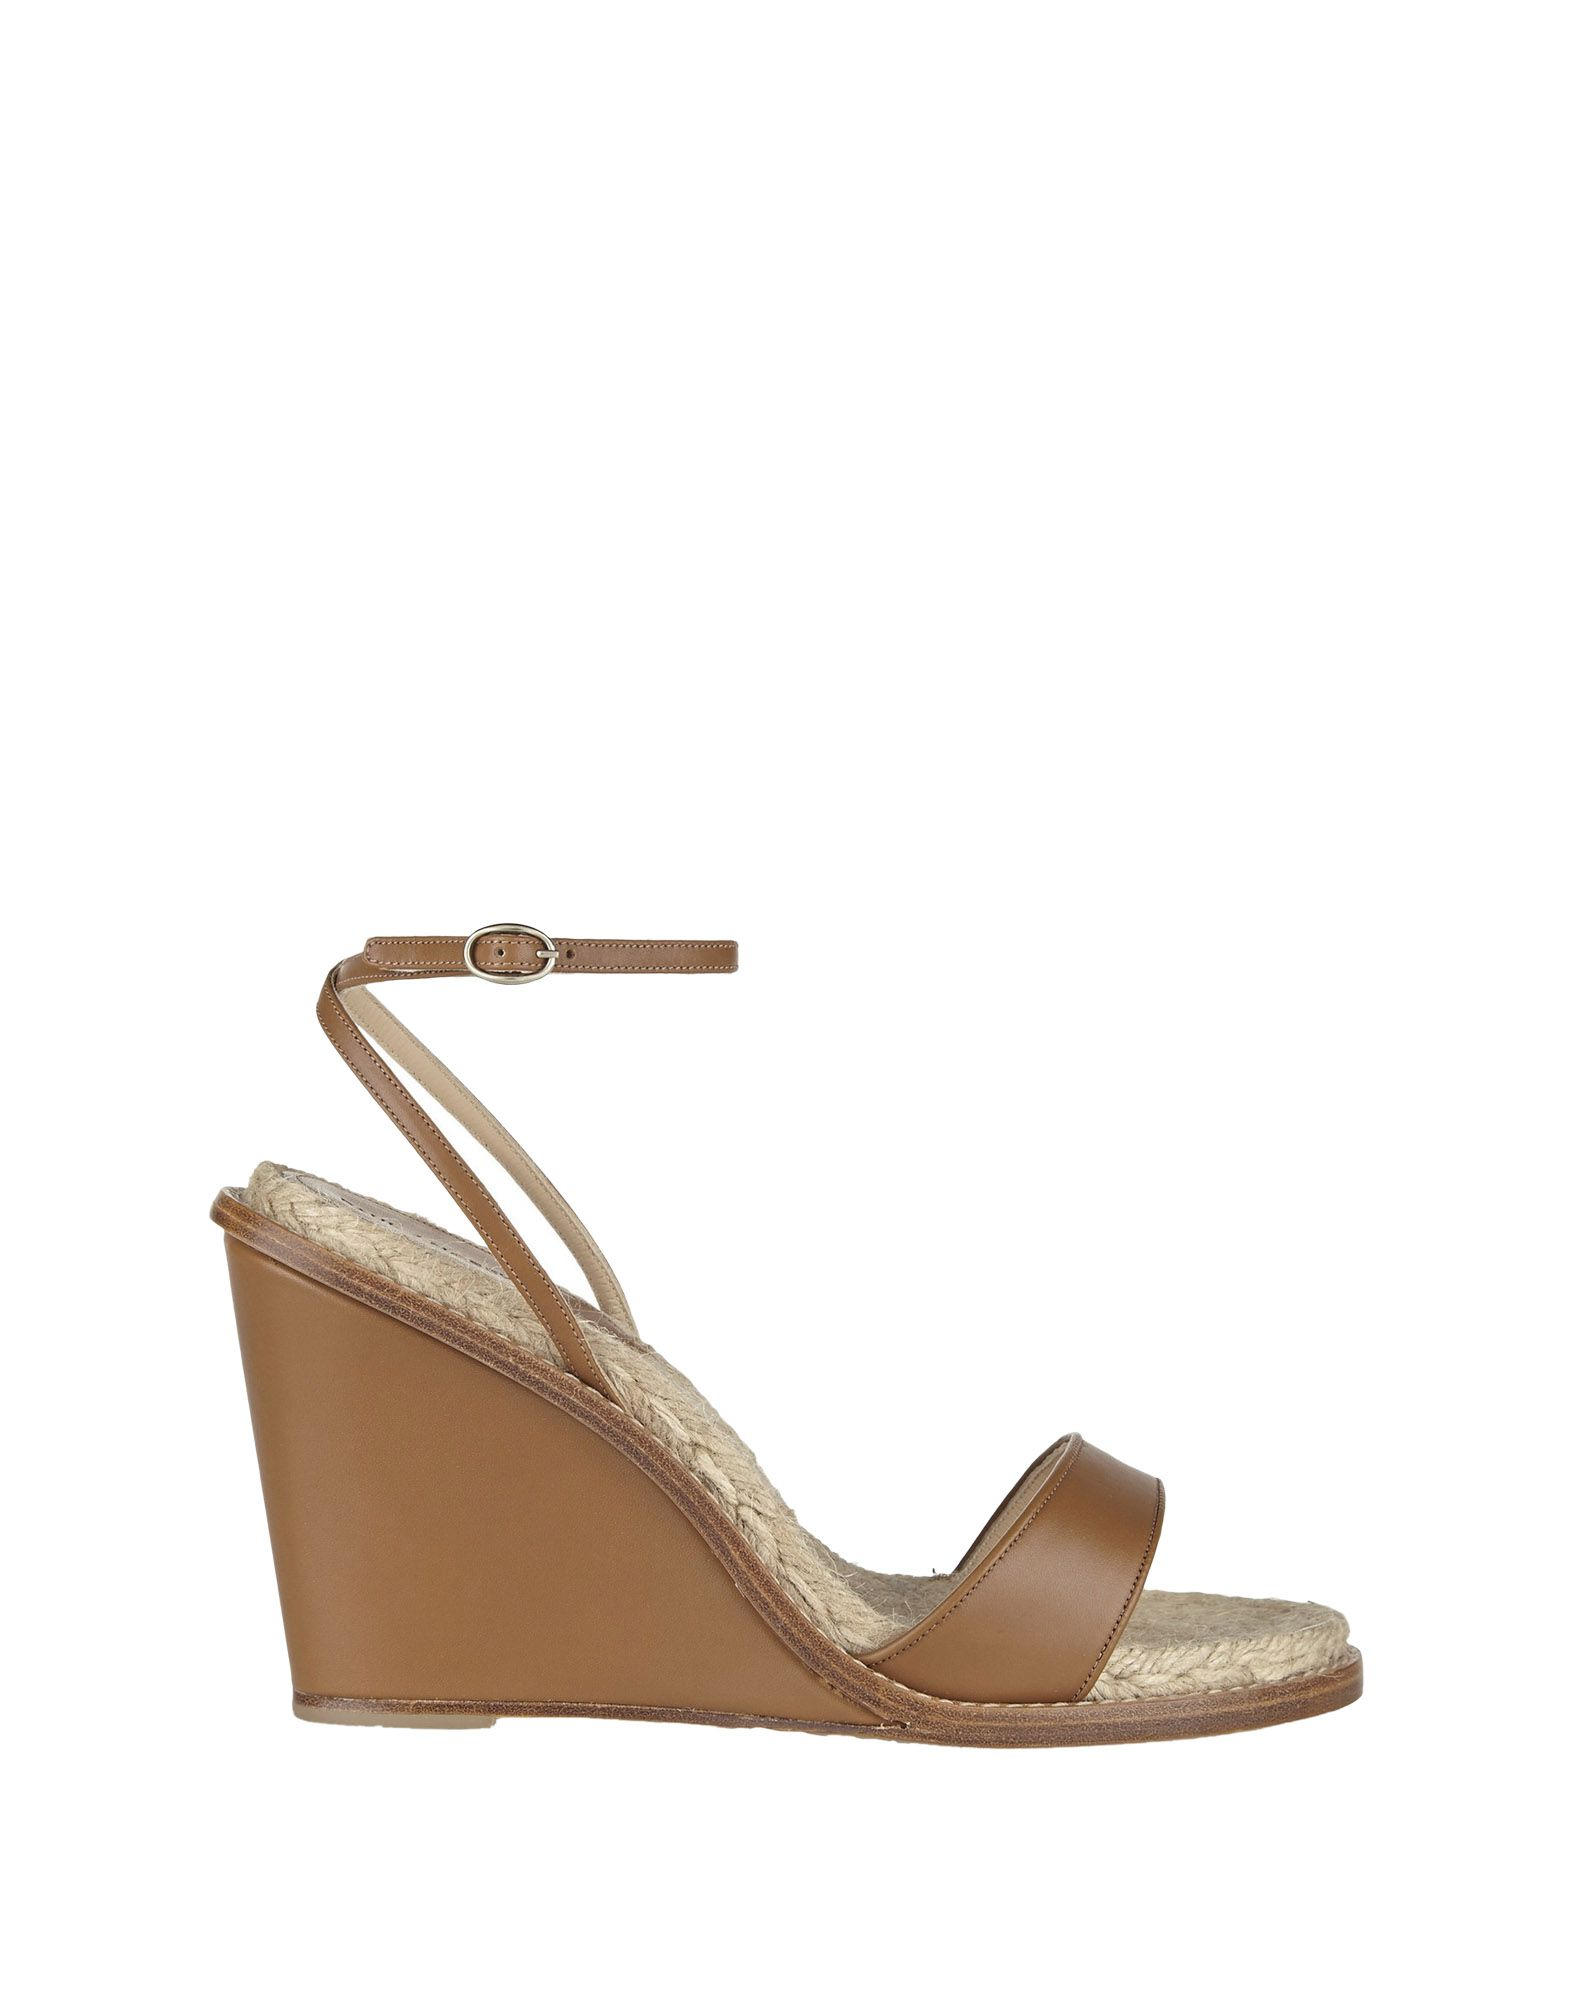 Paul Andrew Sandalen Damen  11435905OFGut aussehende strapazierfähige Schuhe